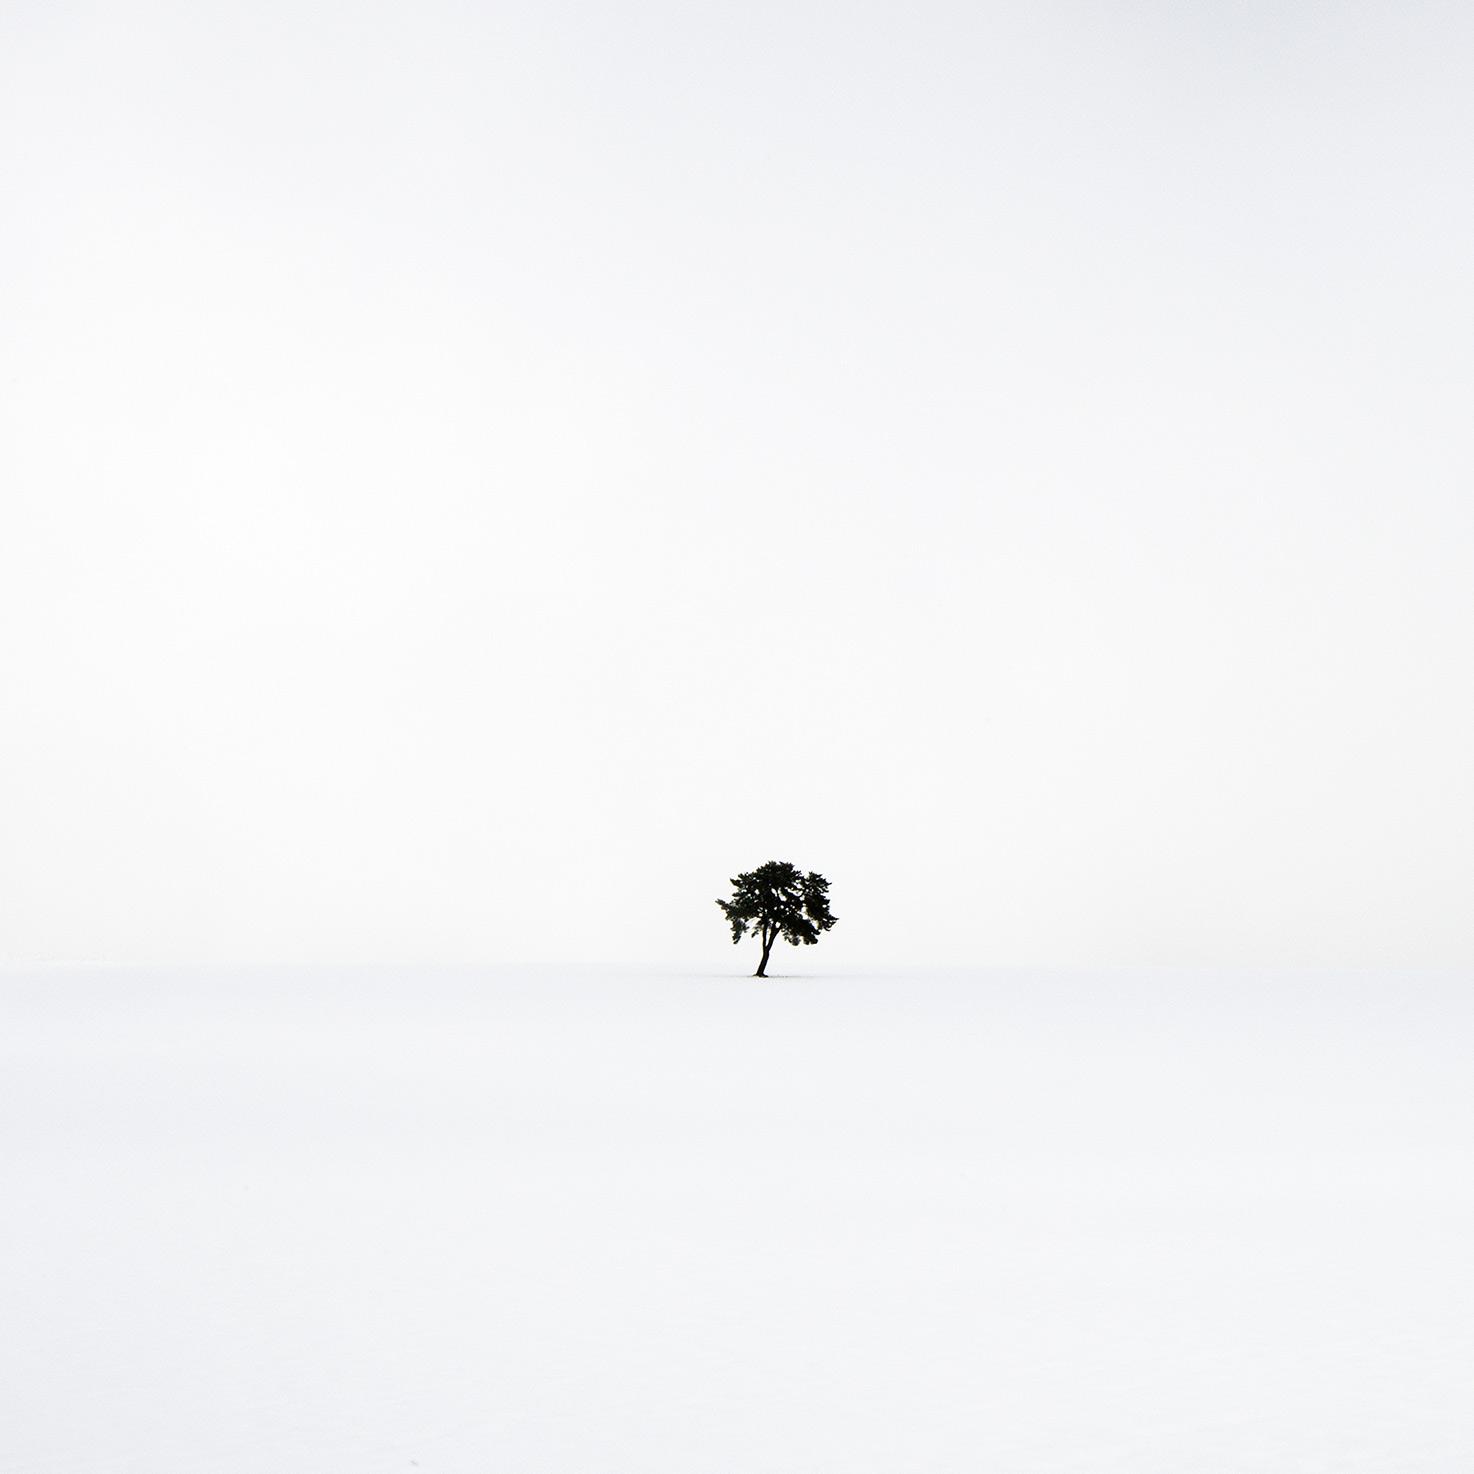 Thierry VEZON - 2.jpg